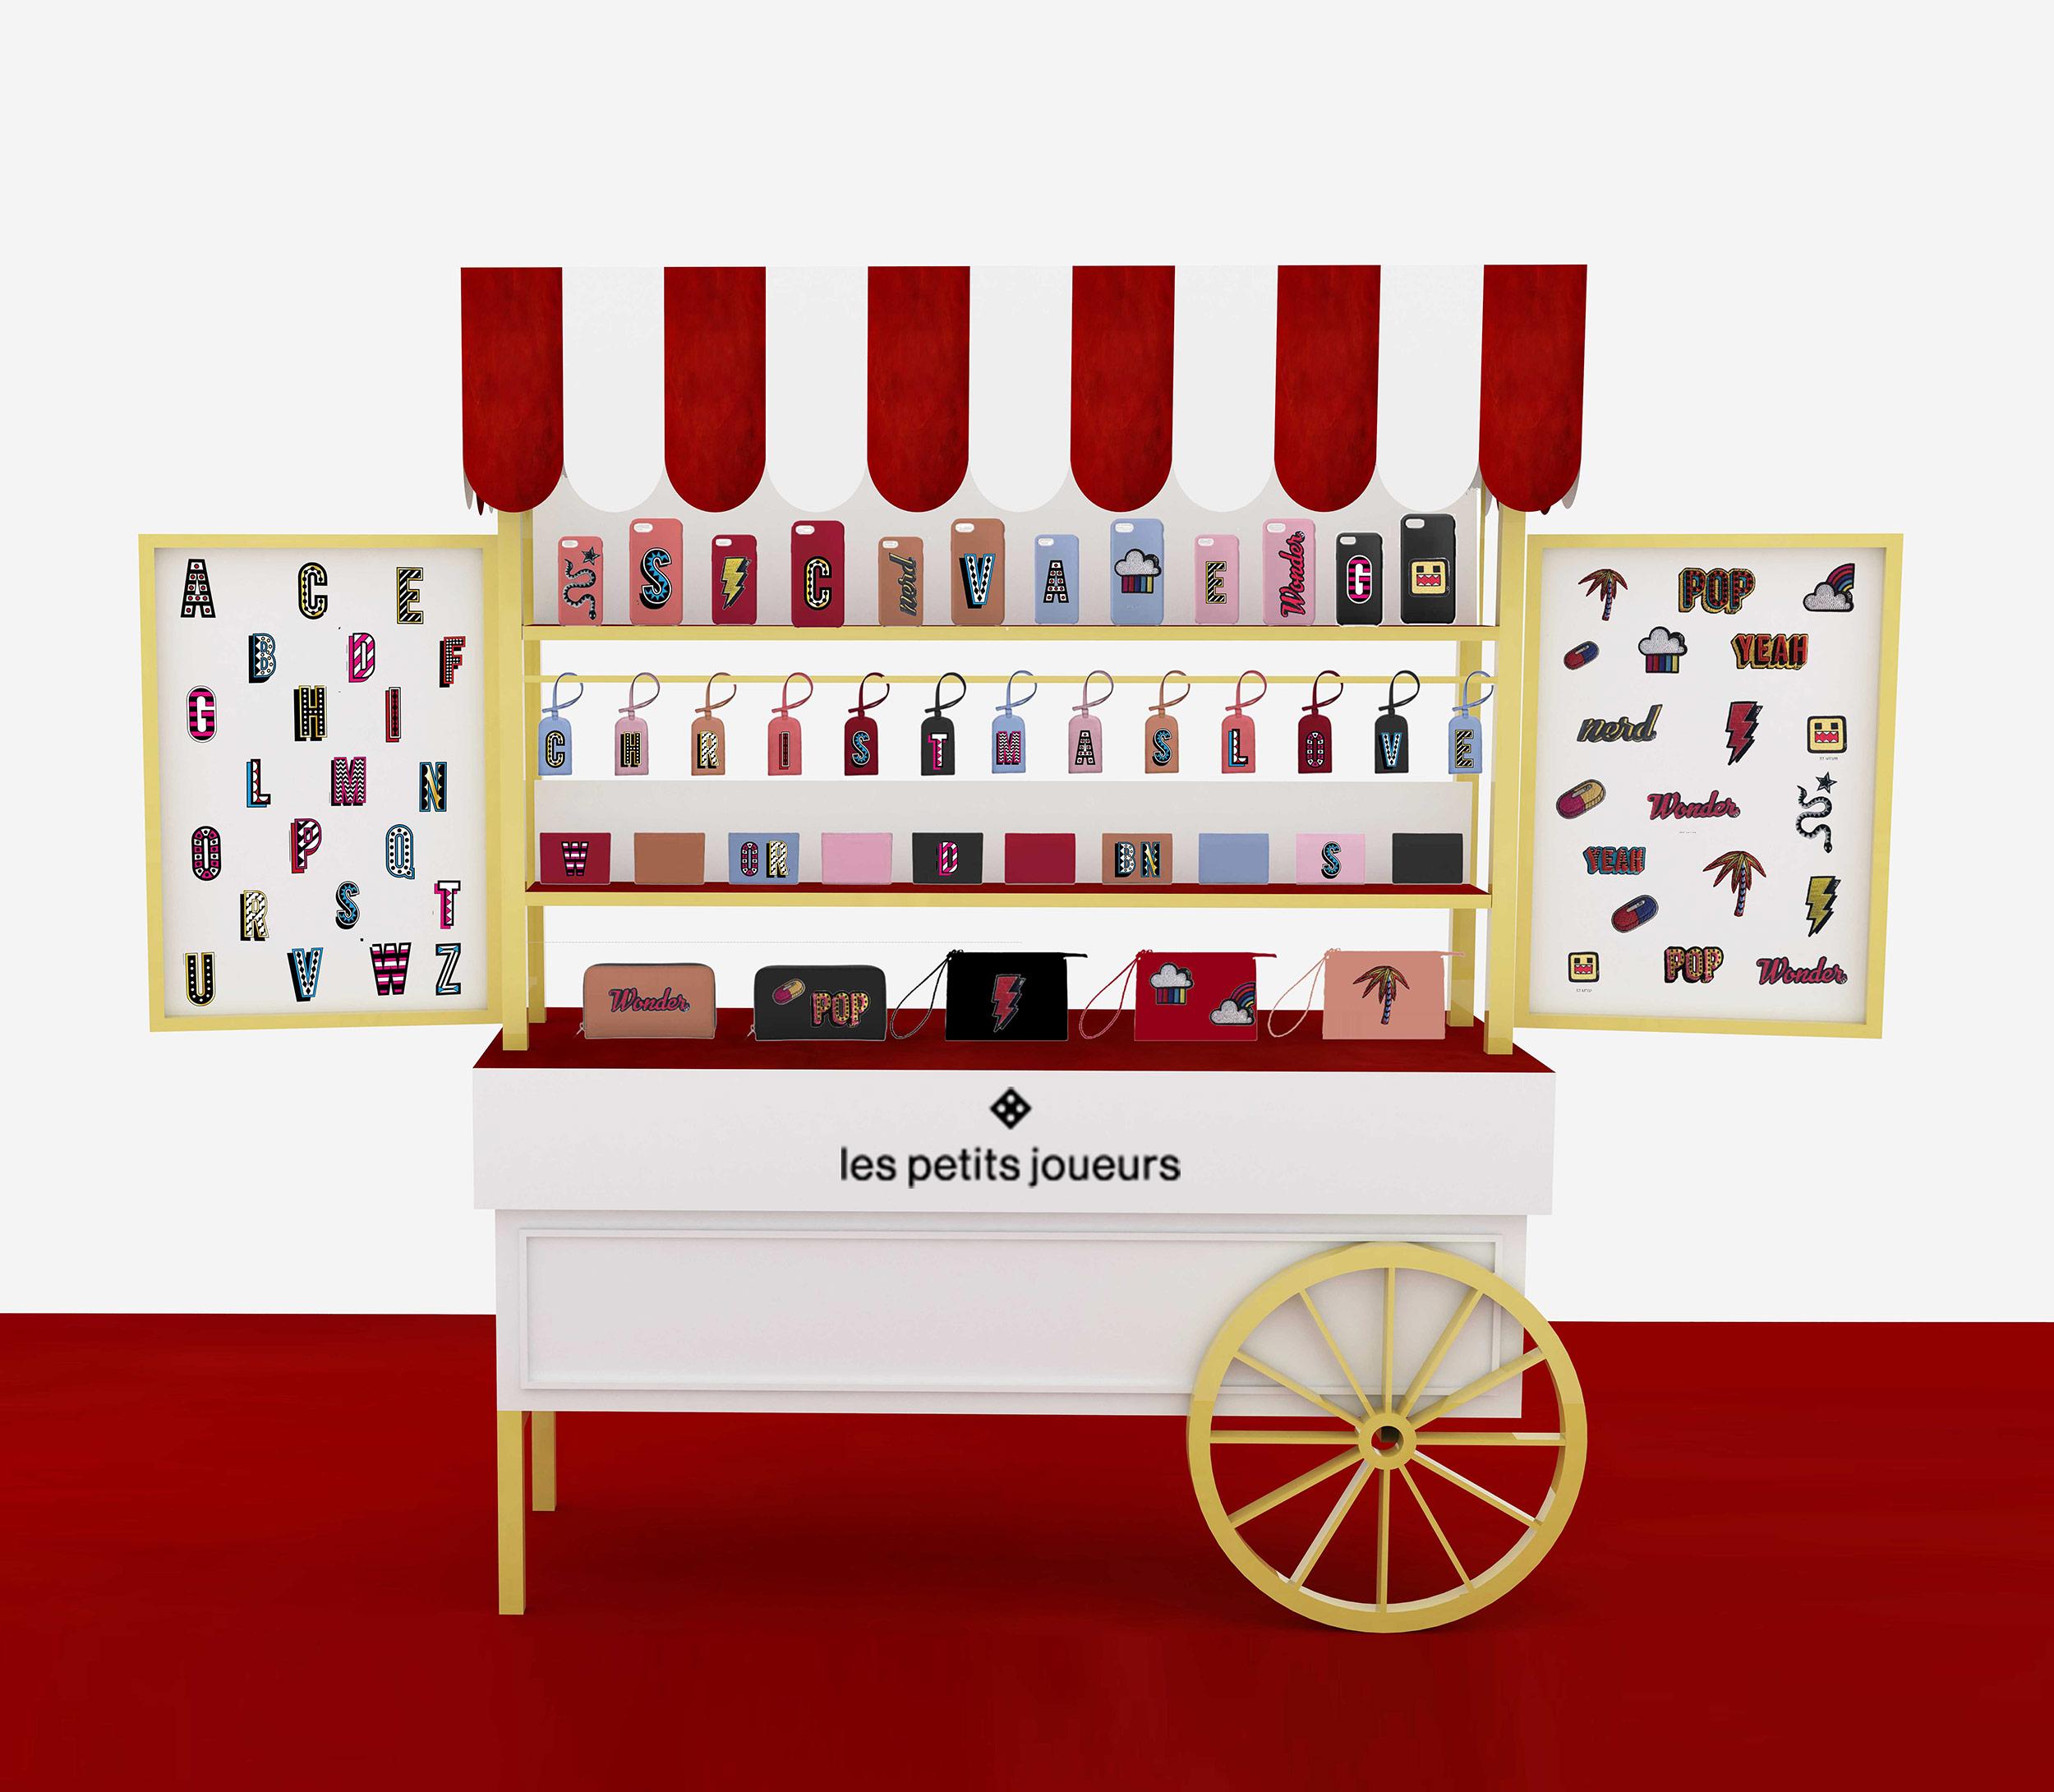 0a8b6c9c18 Christmas Cart Pop up for Les Petits Joueurs Customization Project  RINASCENTE